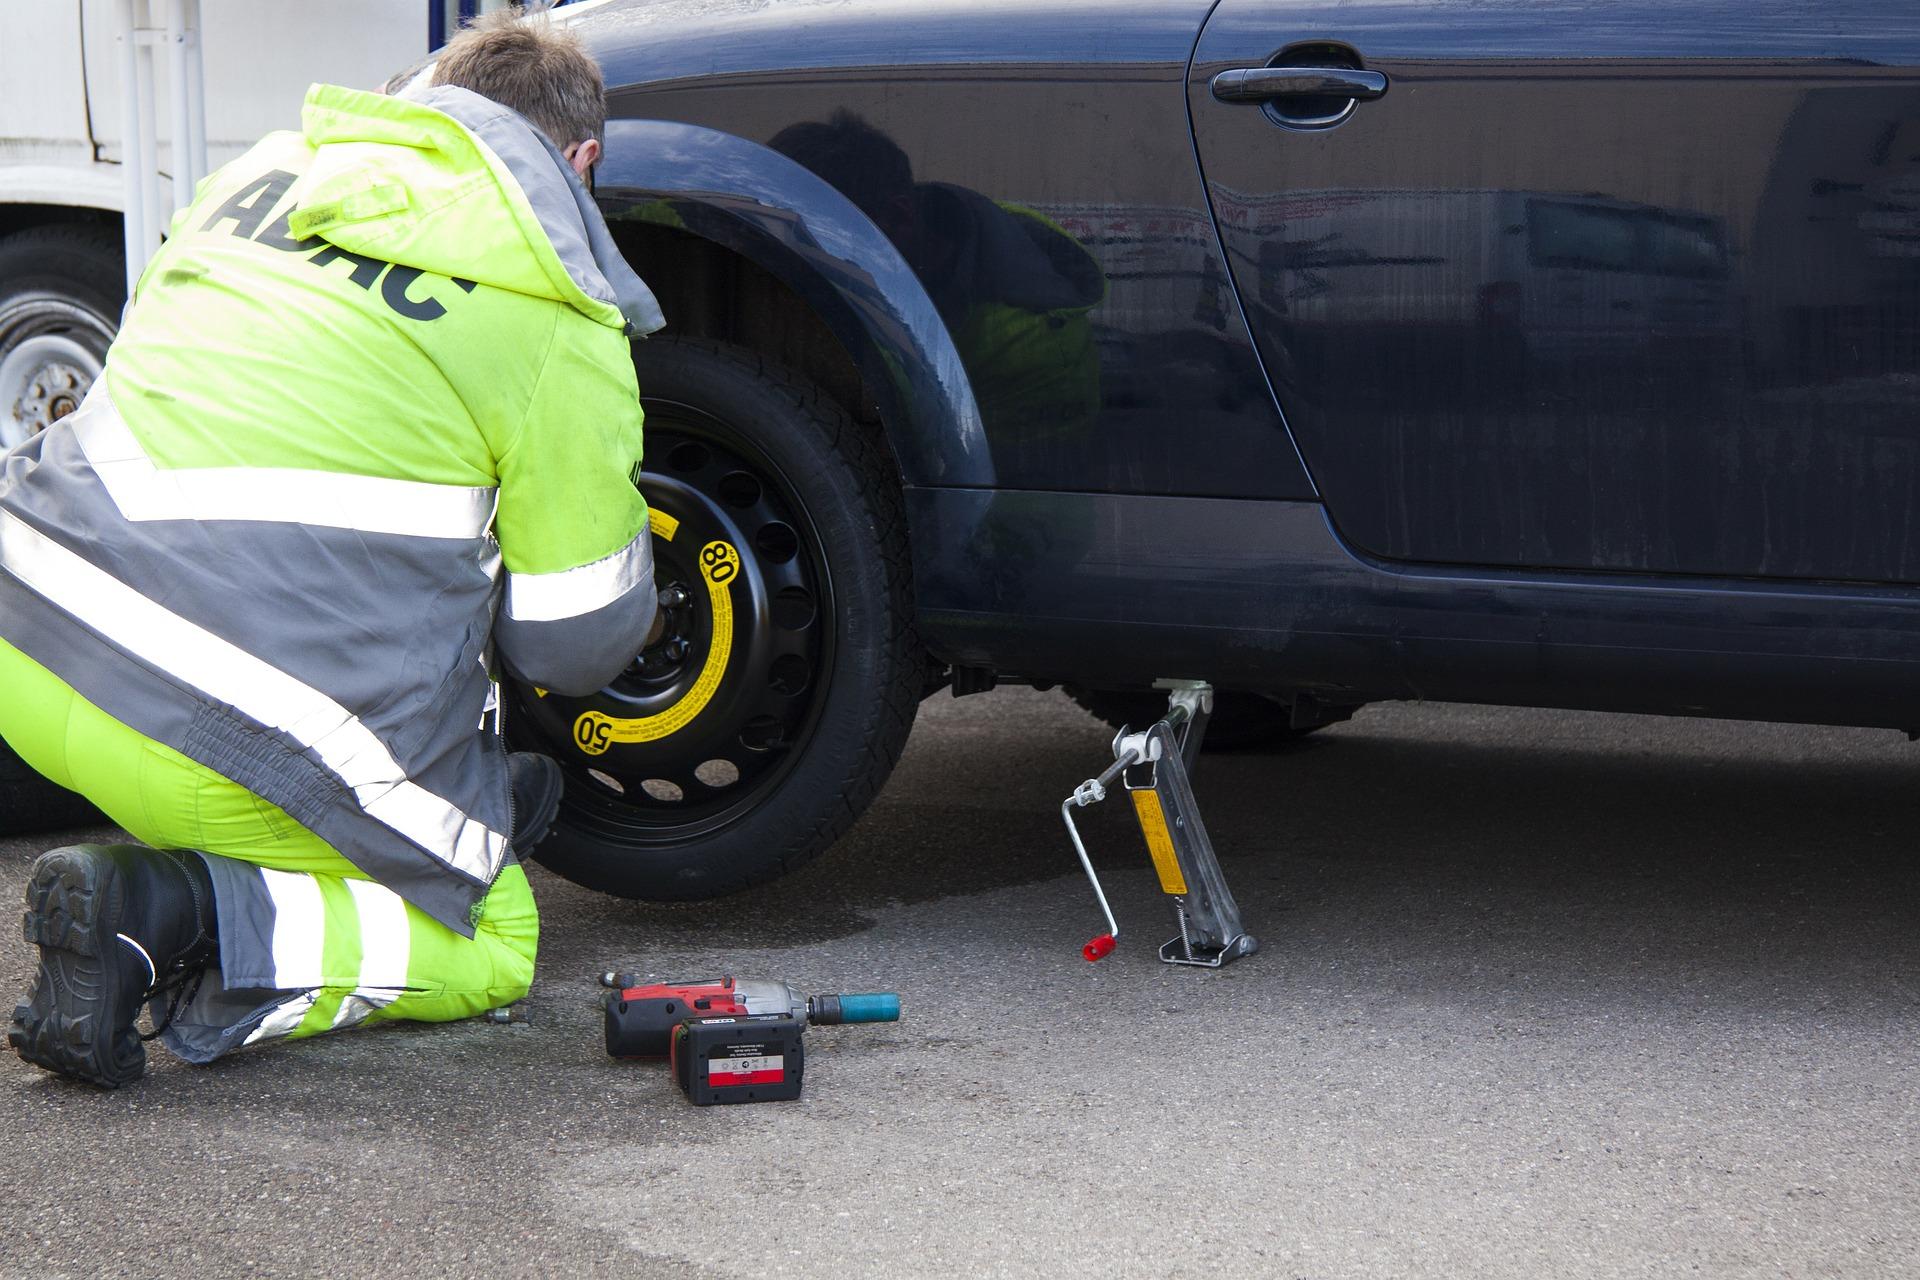 flat-tire-76563_1920.jpg